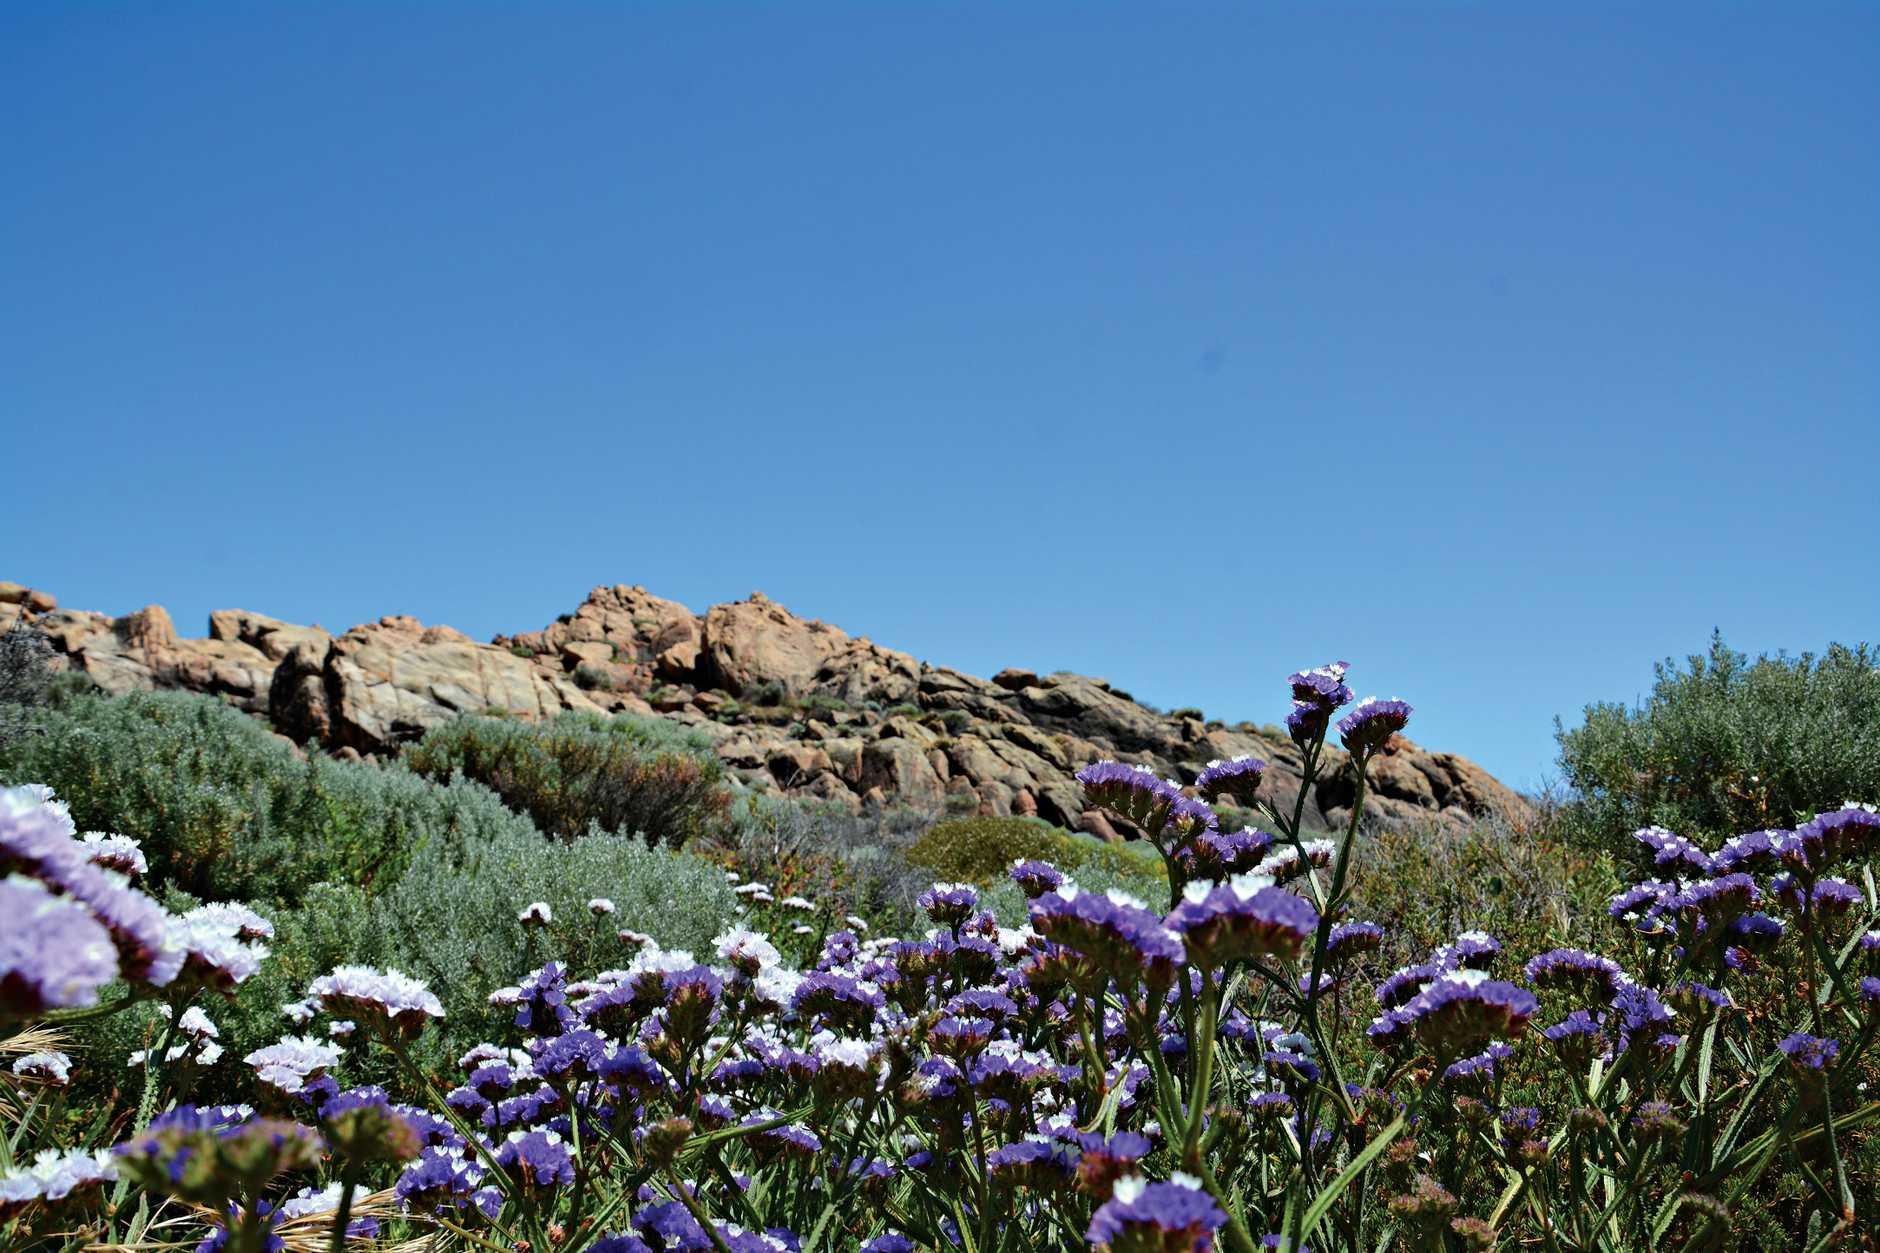 Canal Rocks on the Indian Ocean, in the Margaret River region in Western Australia.